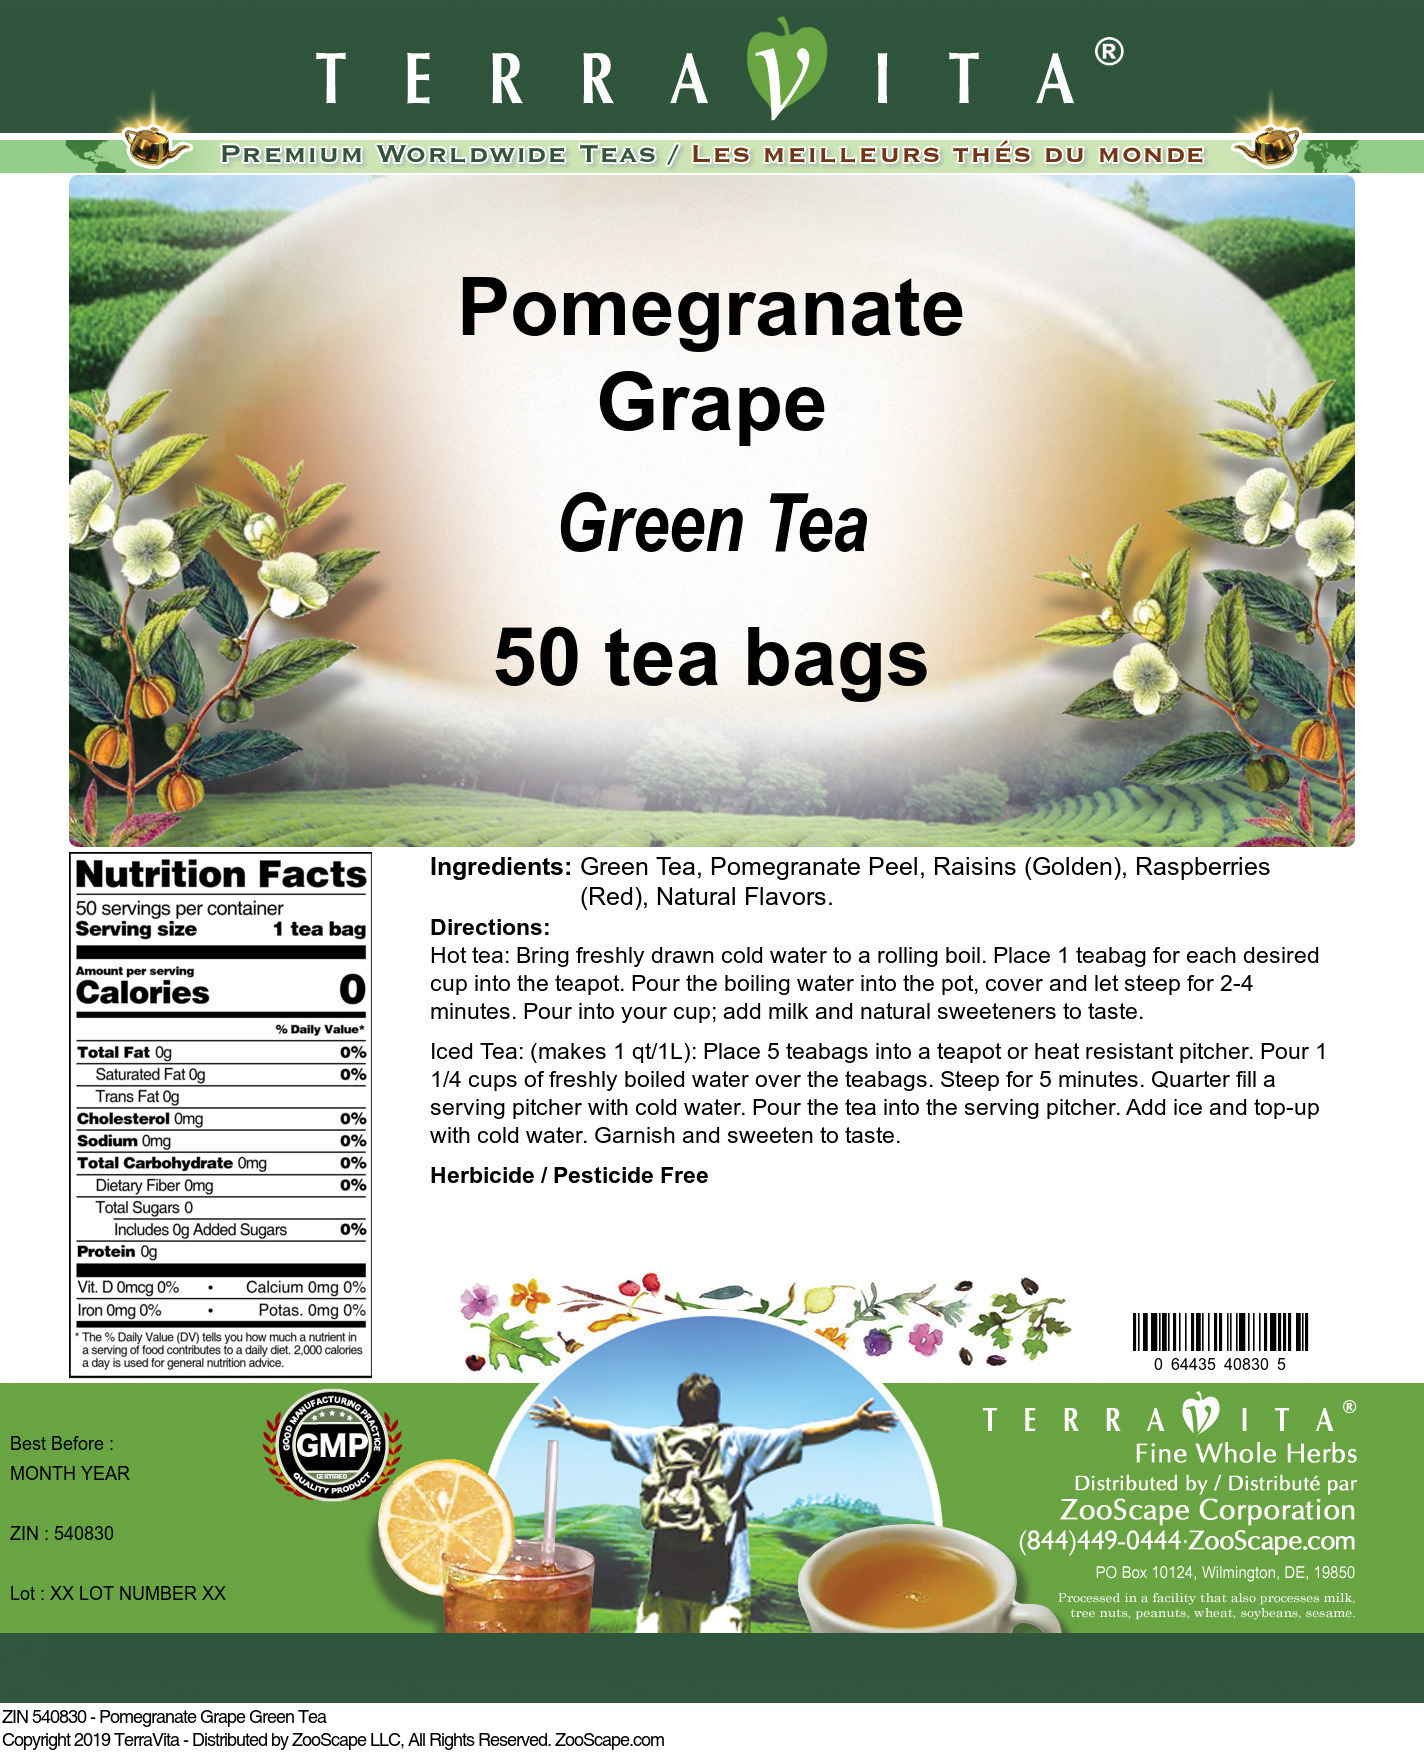 Pomegranate Grape Green Tea